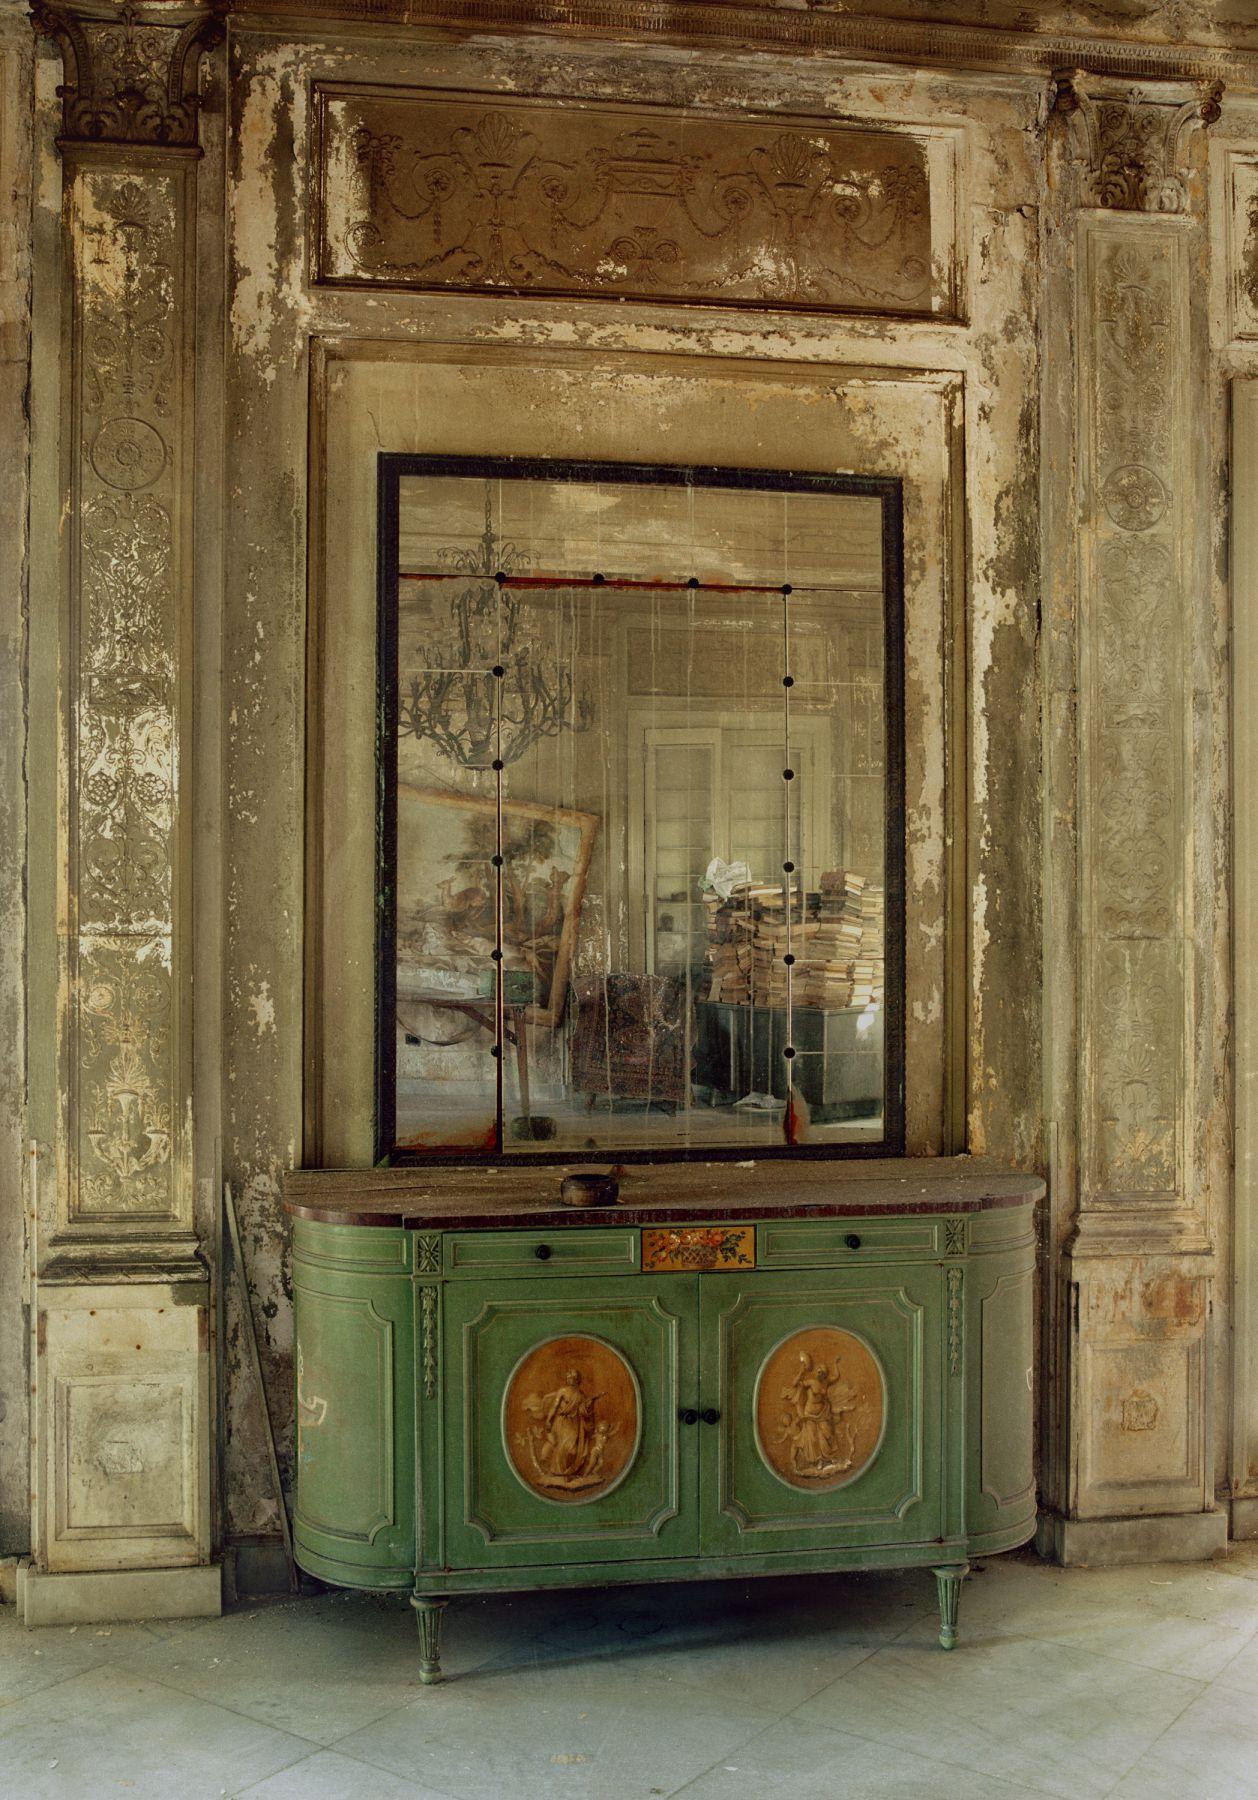 michael eastman isabella's mirror